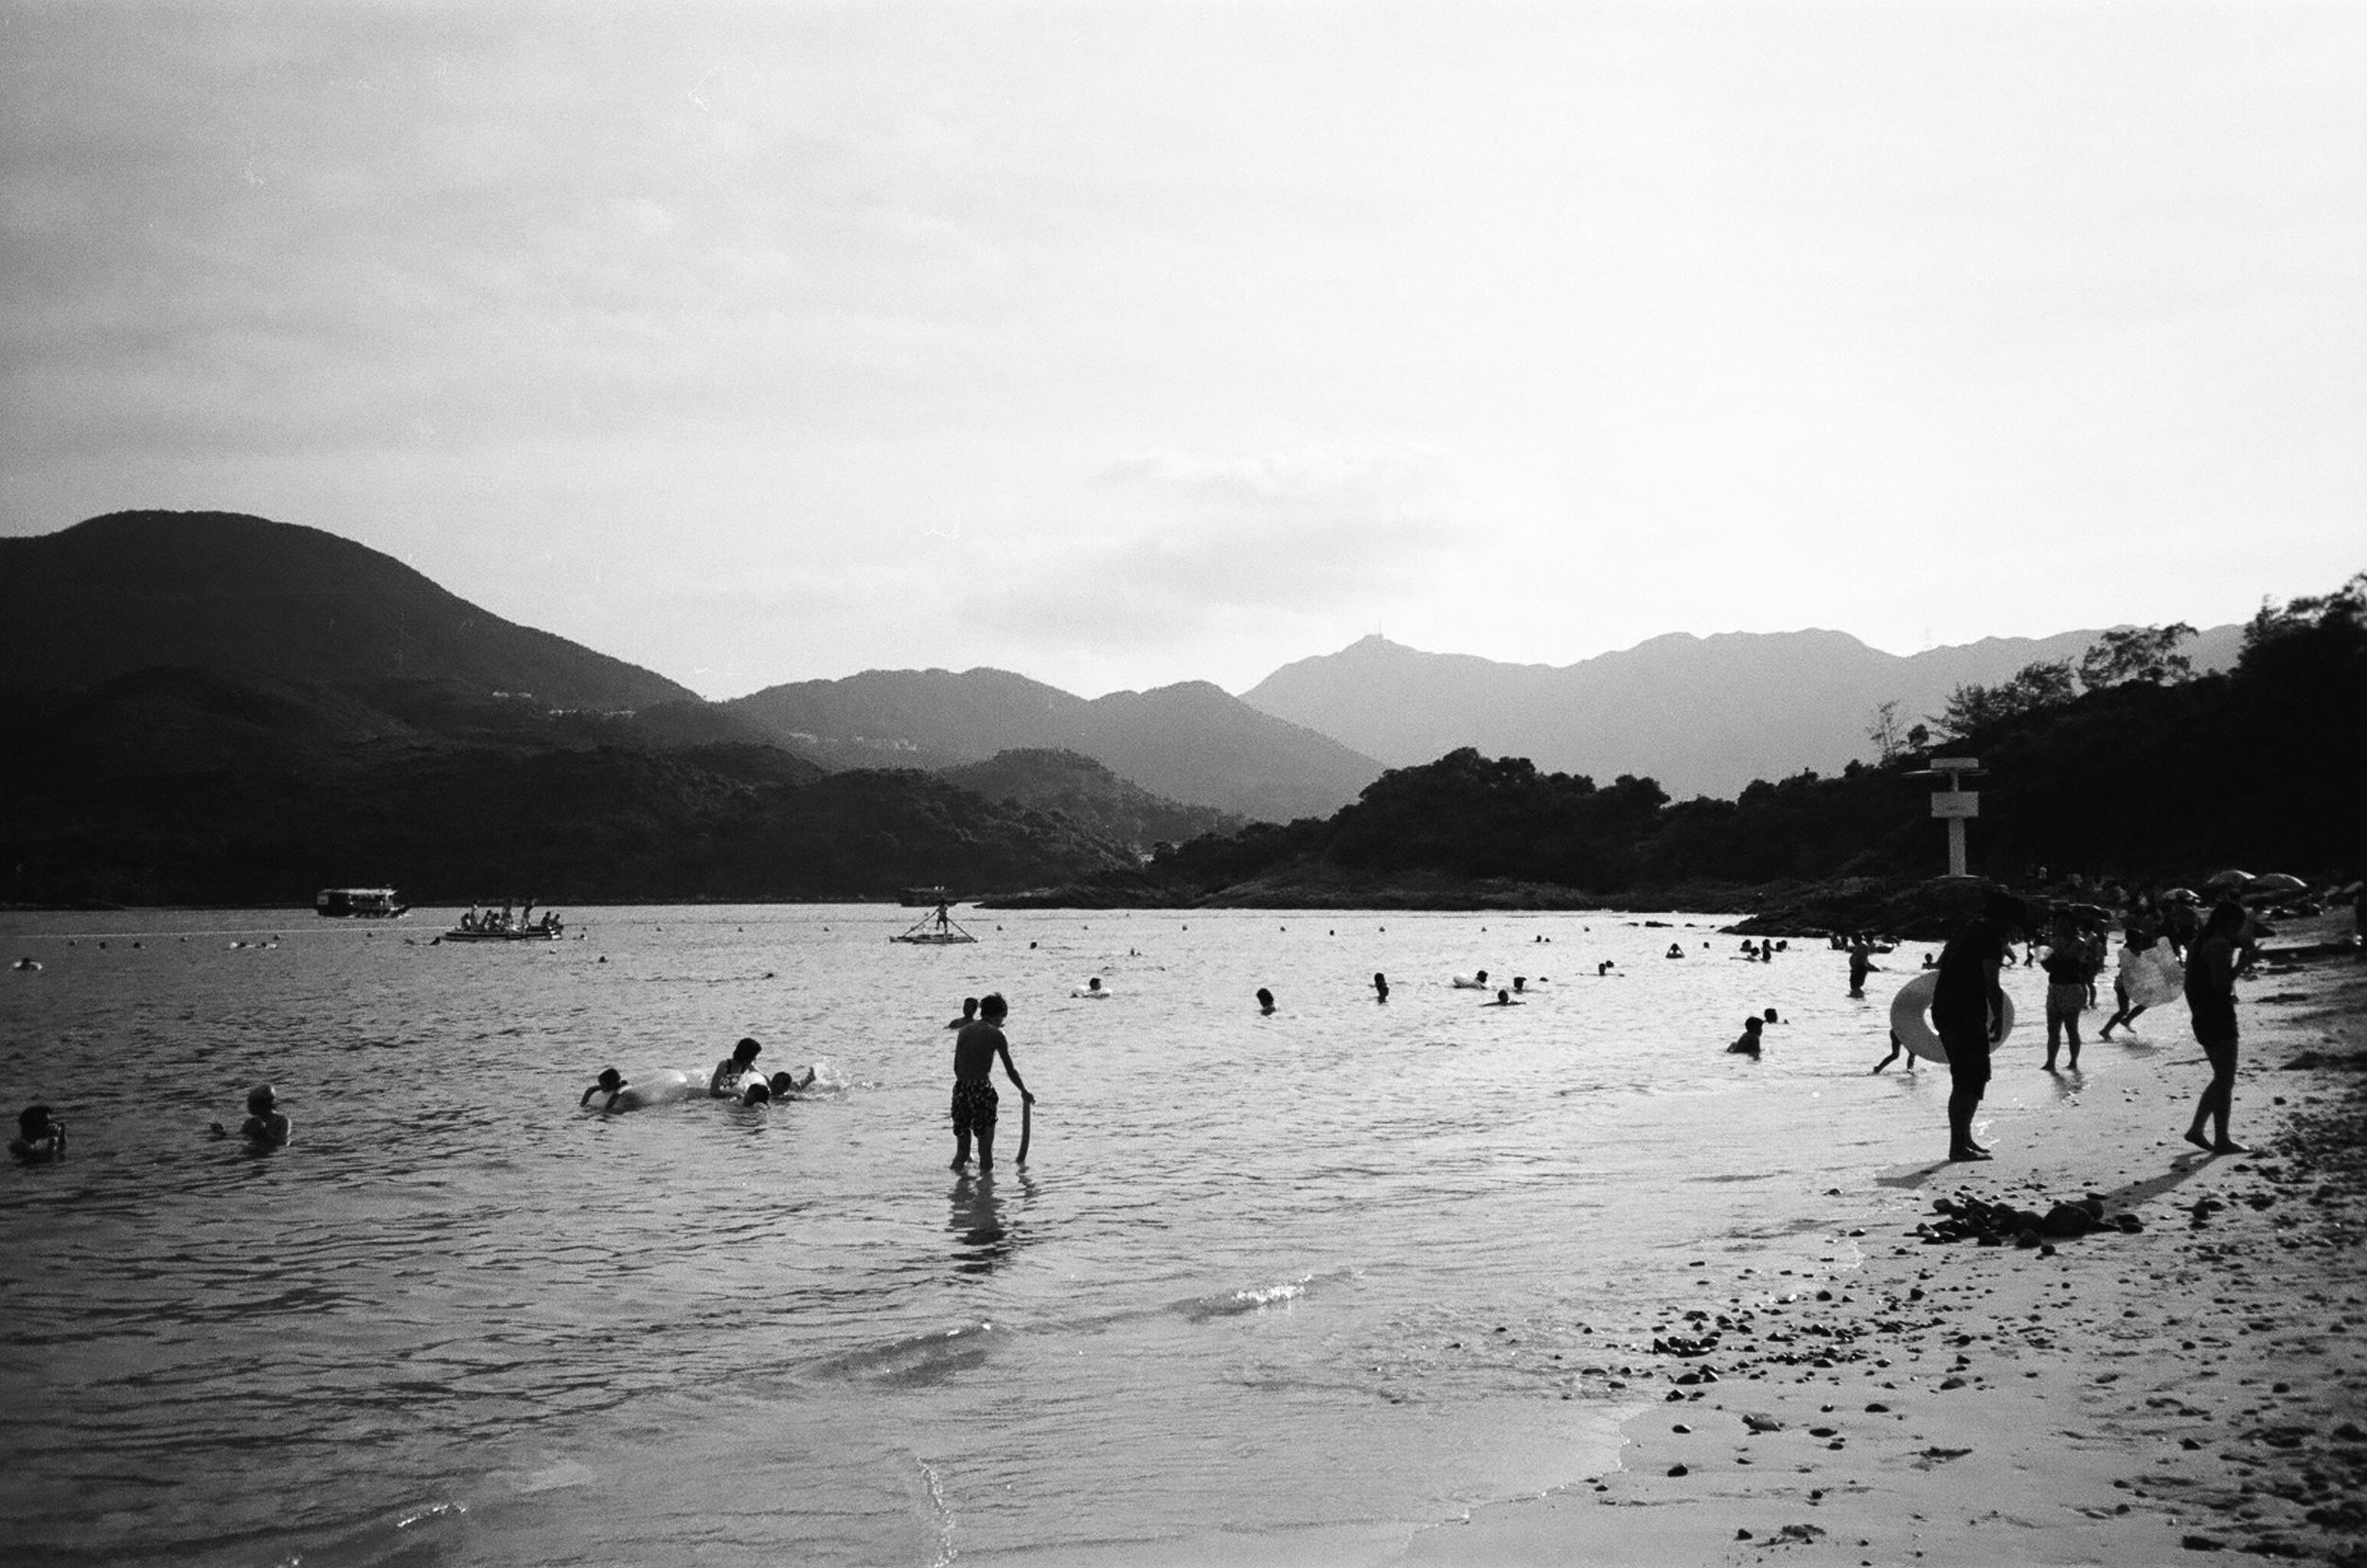 Kenting, Taiwan, 2012